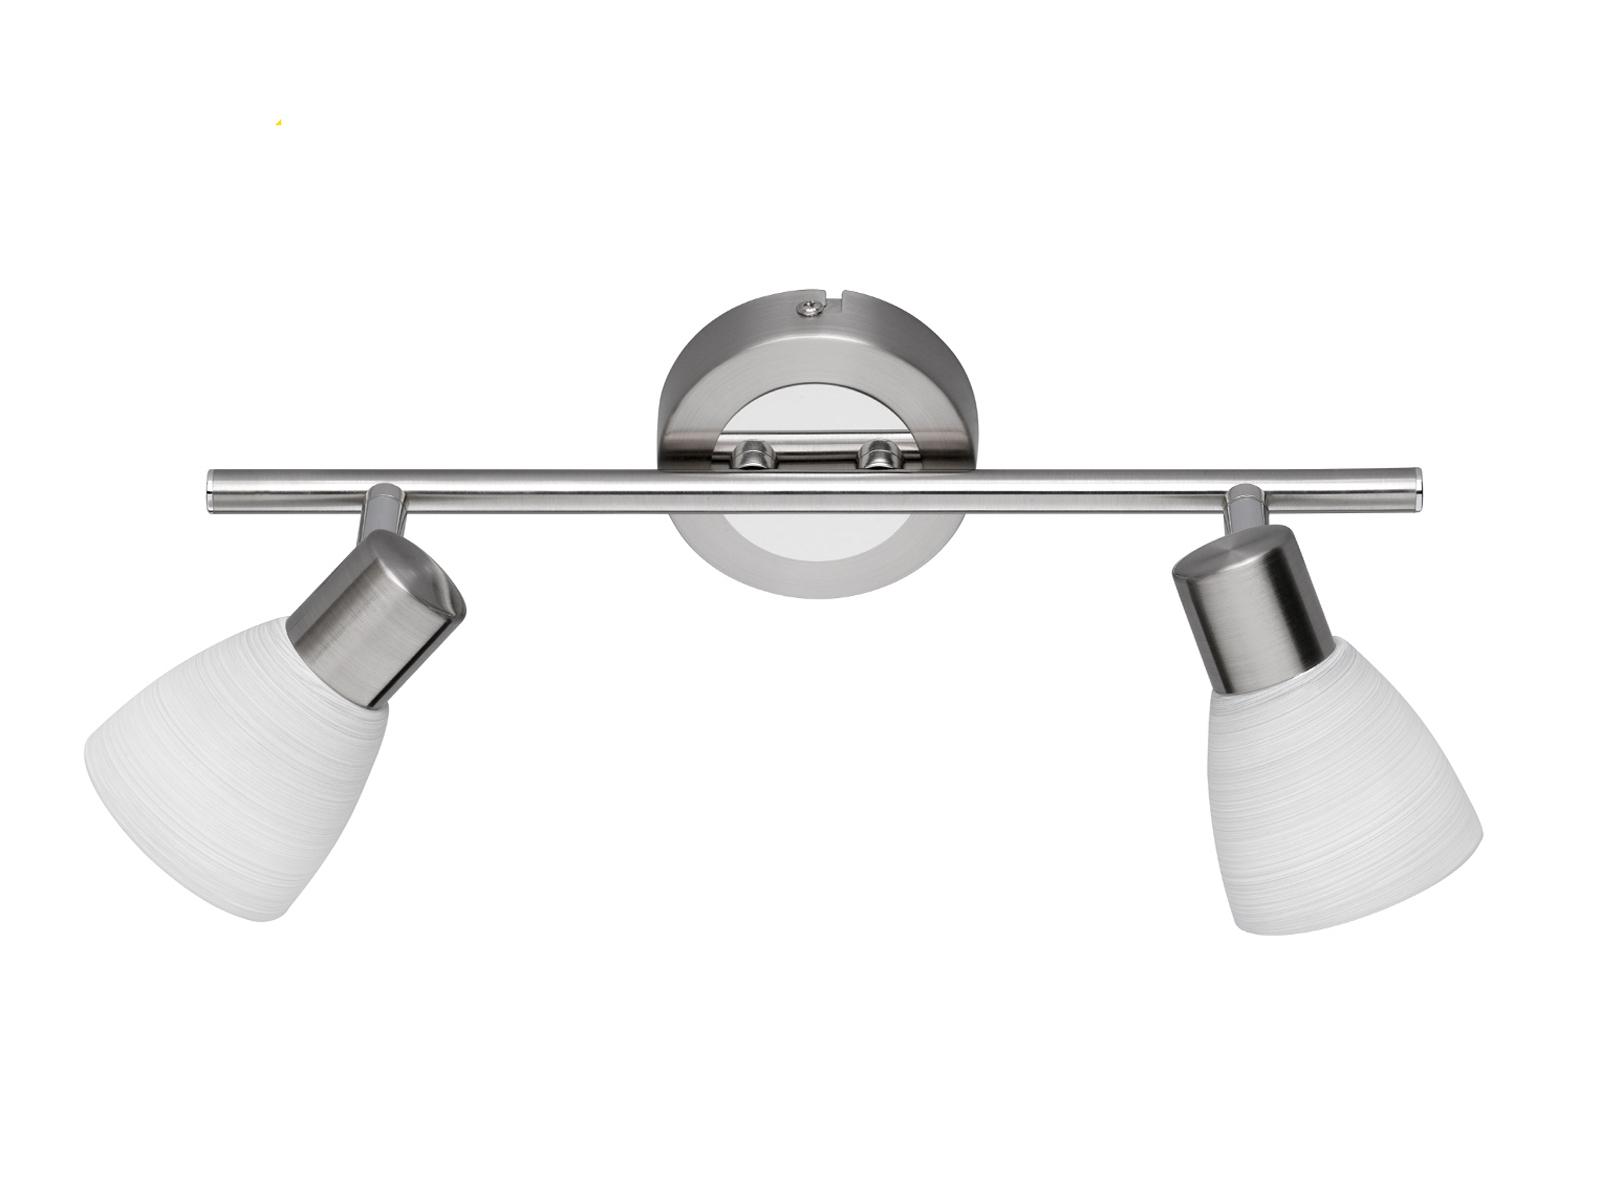 LED Wandleuchte Wandspot CARICO Nickel matt Glas weiß